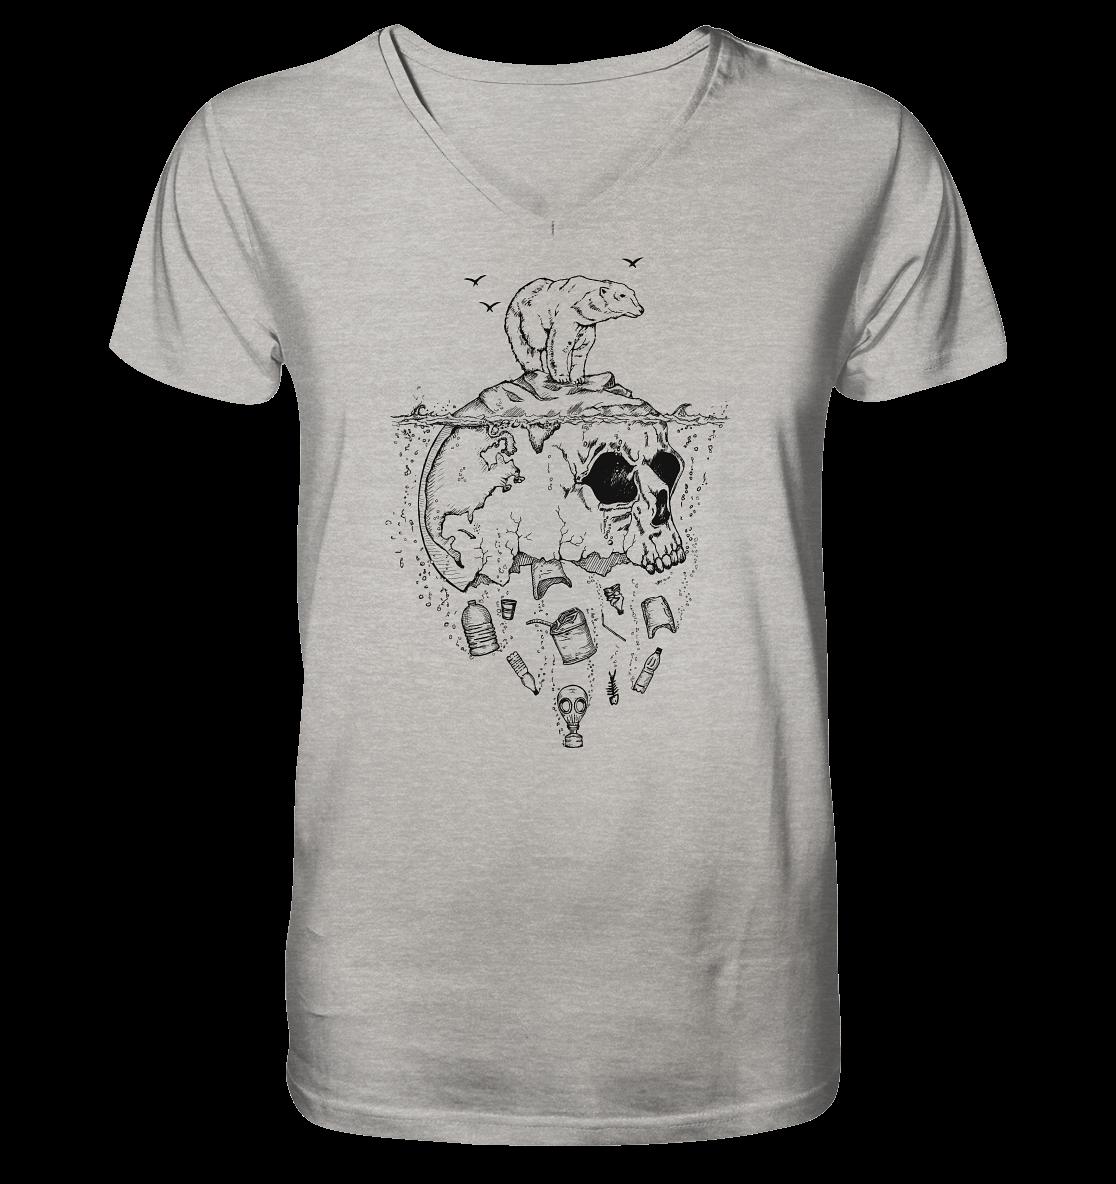 front-mens-organic-v-neck-shirt-c2c1c0-1116x-3.png